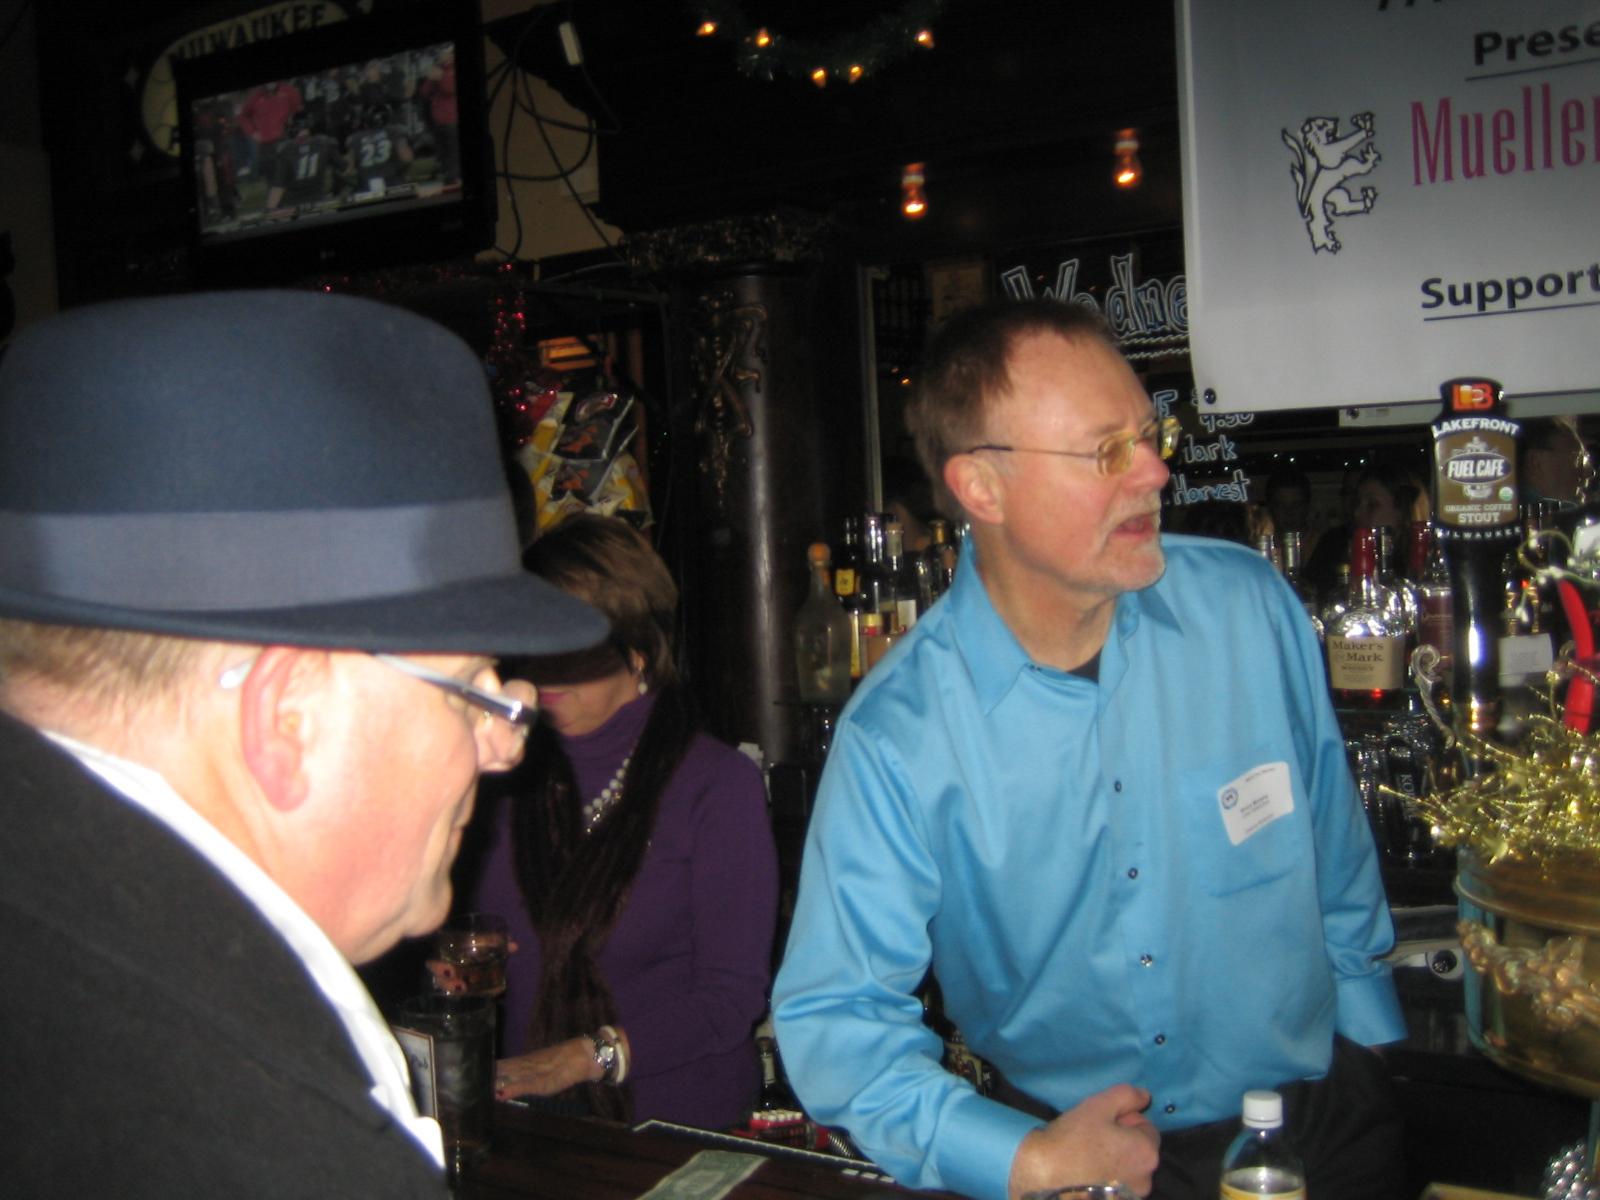 Bruce Murphy working the bar.